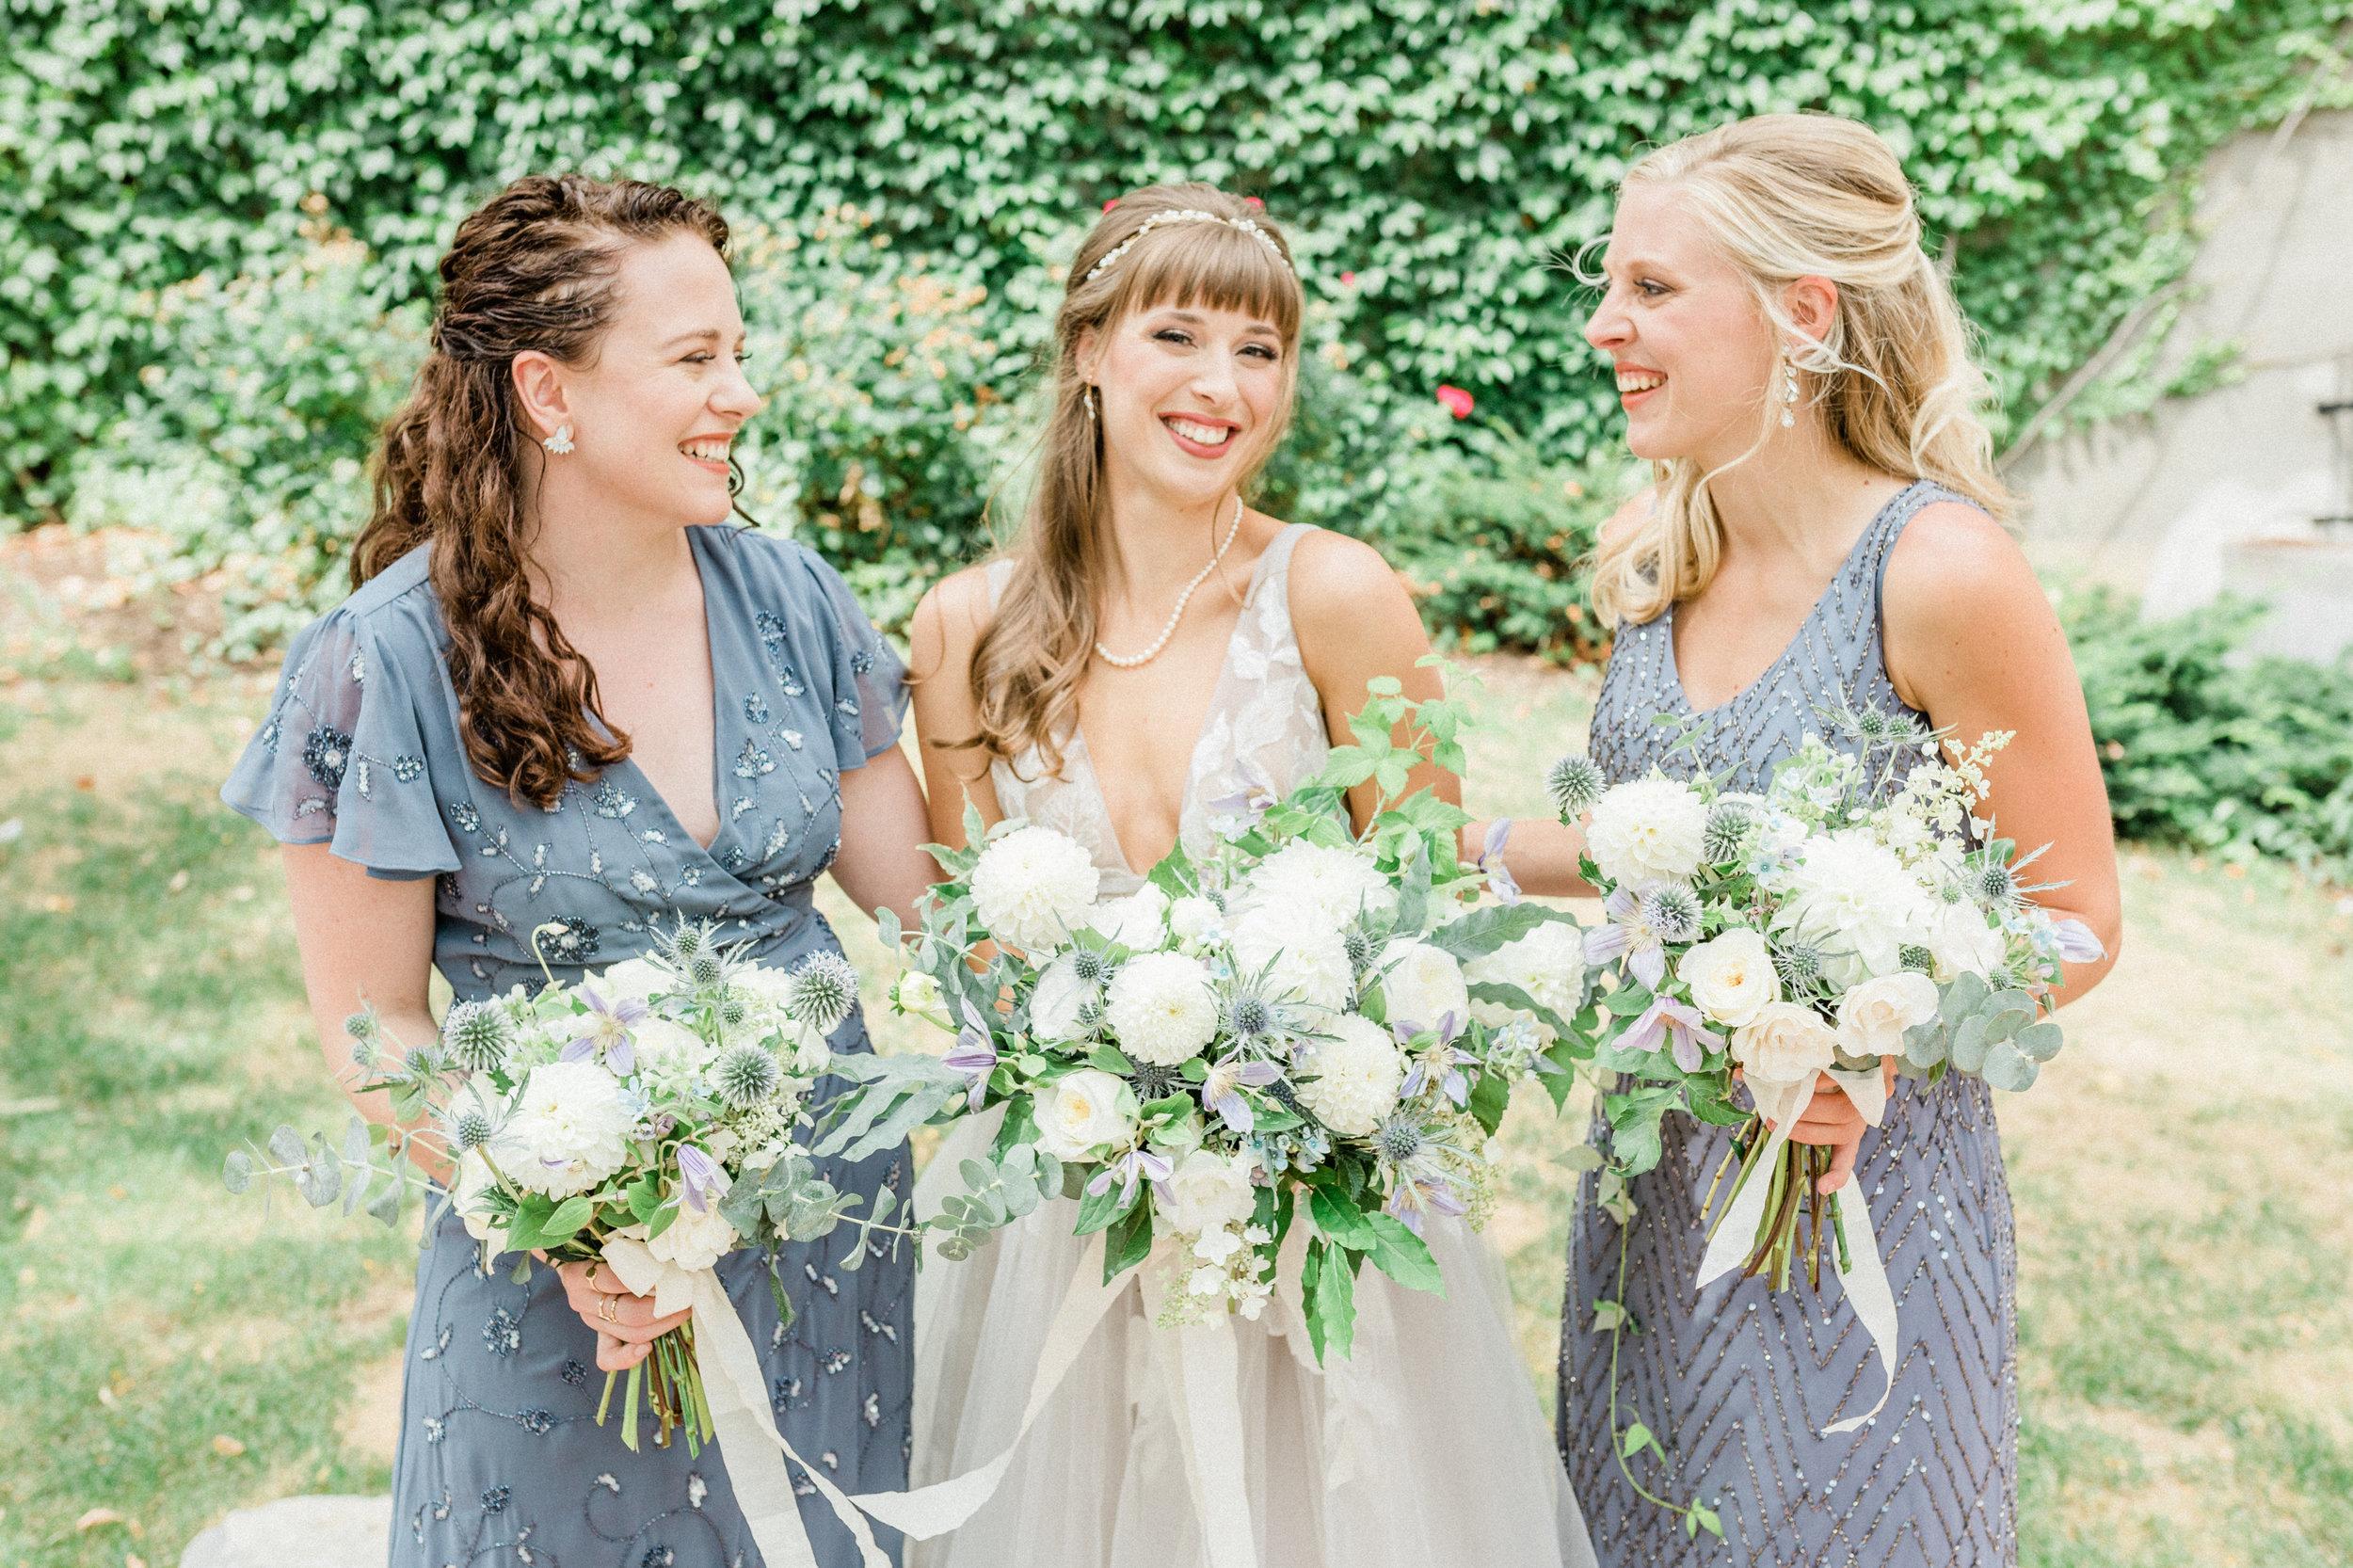 Mallory and Aaron - Married - Sneaks - Lauren Alisse Photography-17.jpg